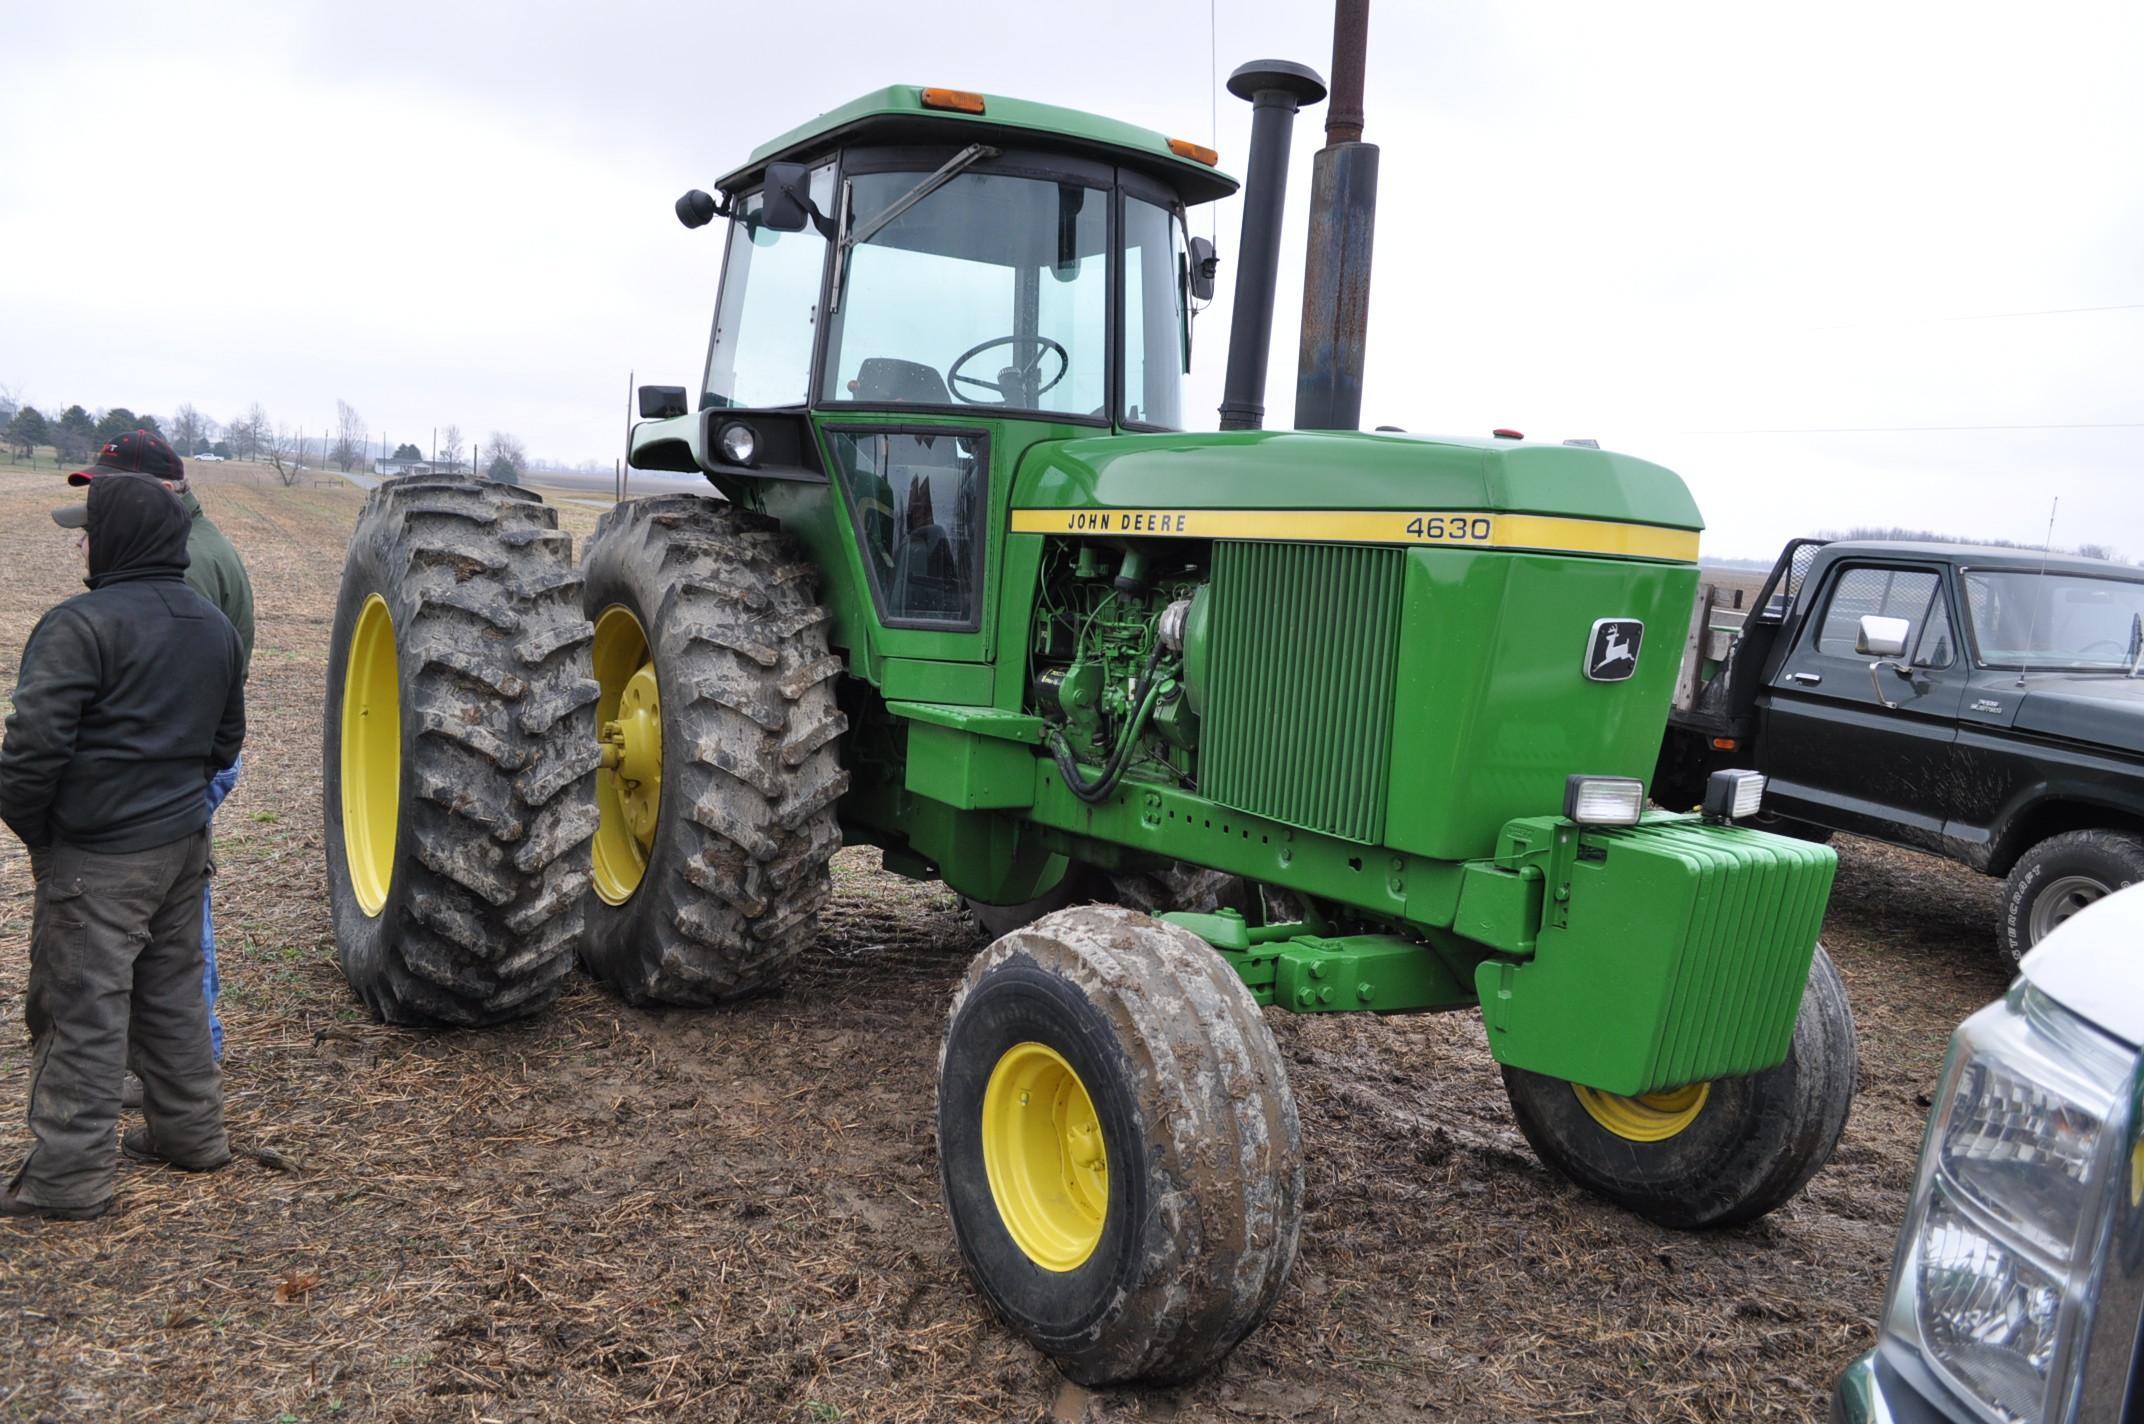 John Deere 4630 tractor, diesel, 20.8-38 hub duals, 14L-16 front, CHA, Quad range, 2 hyd remotes, - Image 4 of 22